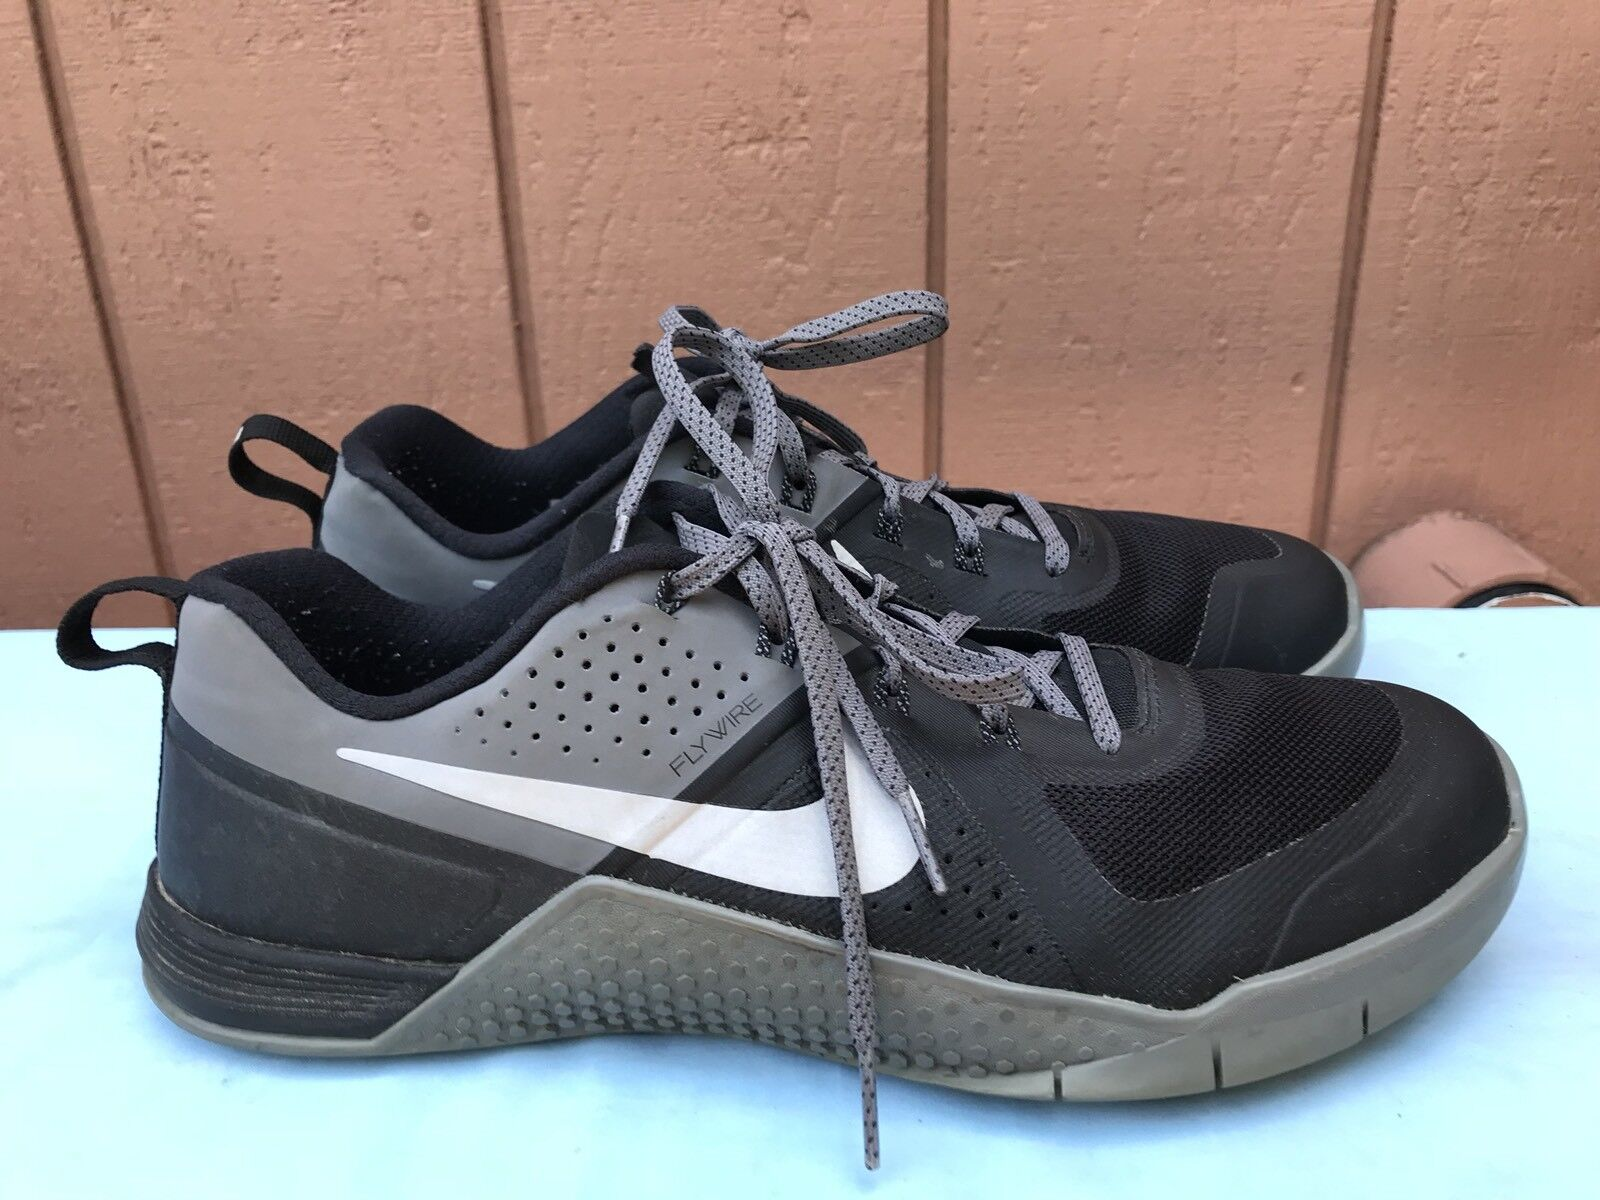 EUC NIKE Men's SZ US 10 METCON 1Training CrossFit Shoes 704688 002 Grey Black A6